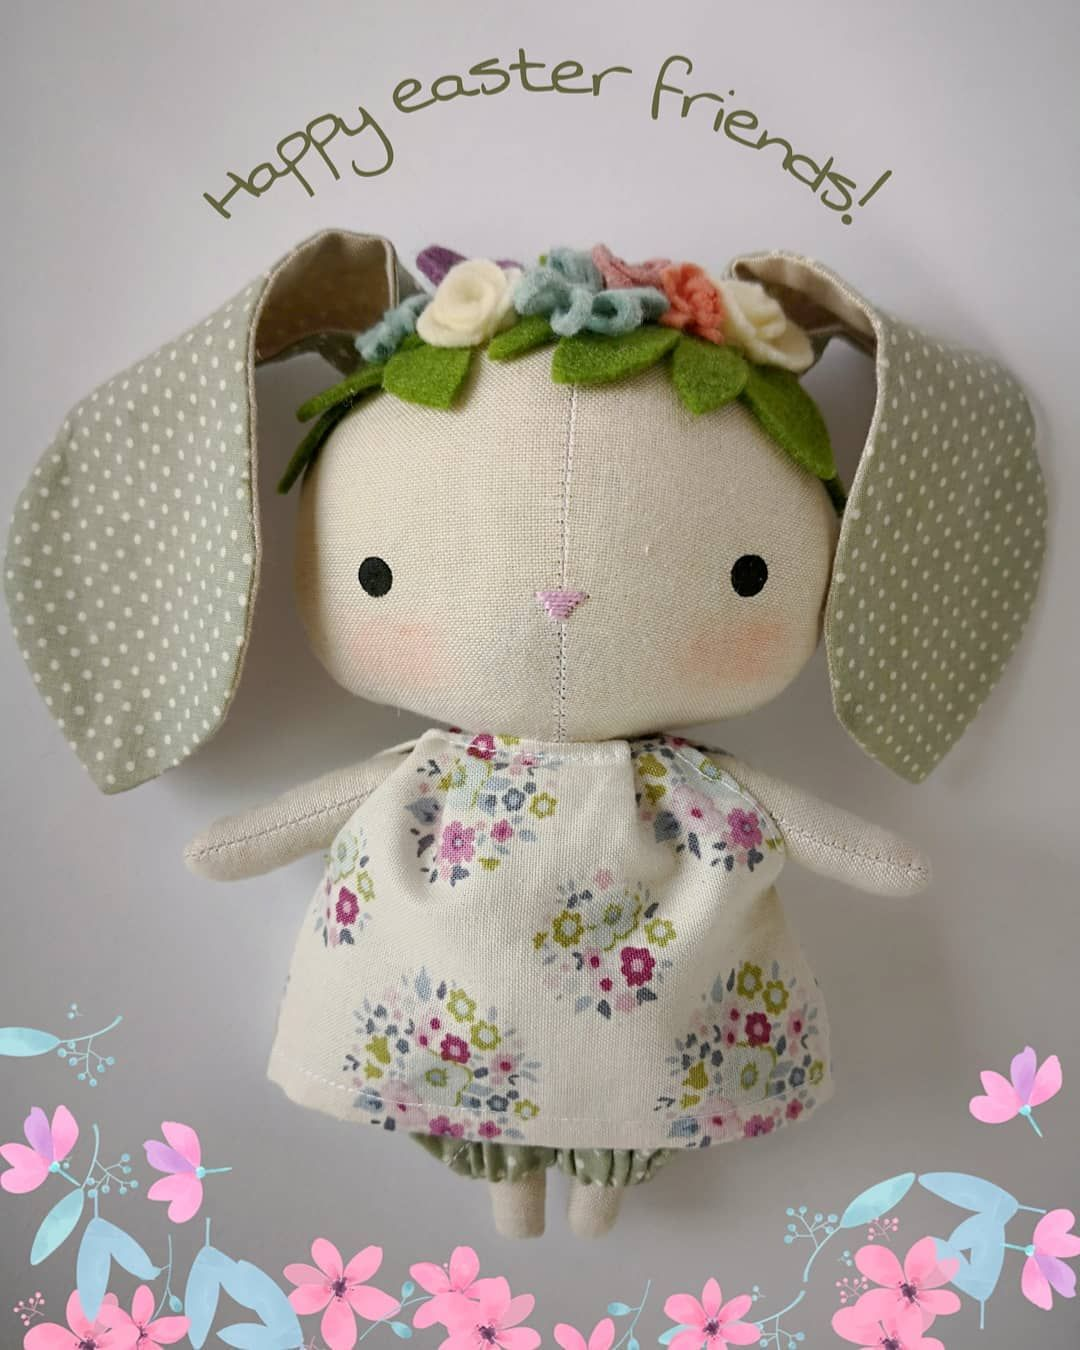 Happy easter friends! #mbdesings #handmade #handmadedoll ...